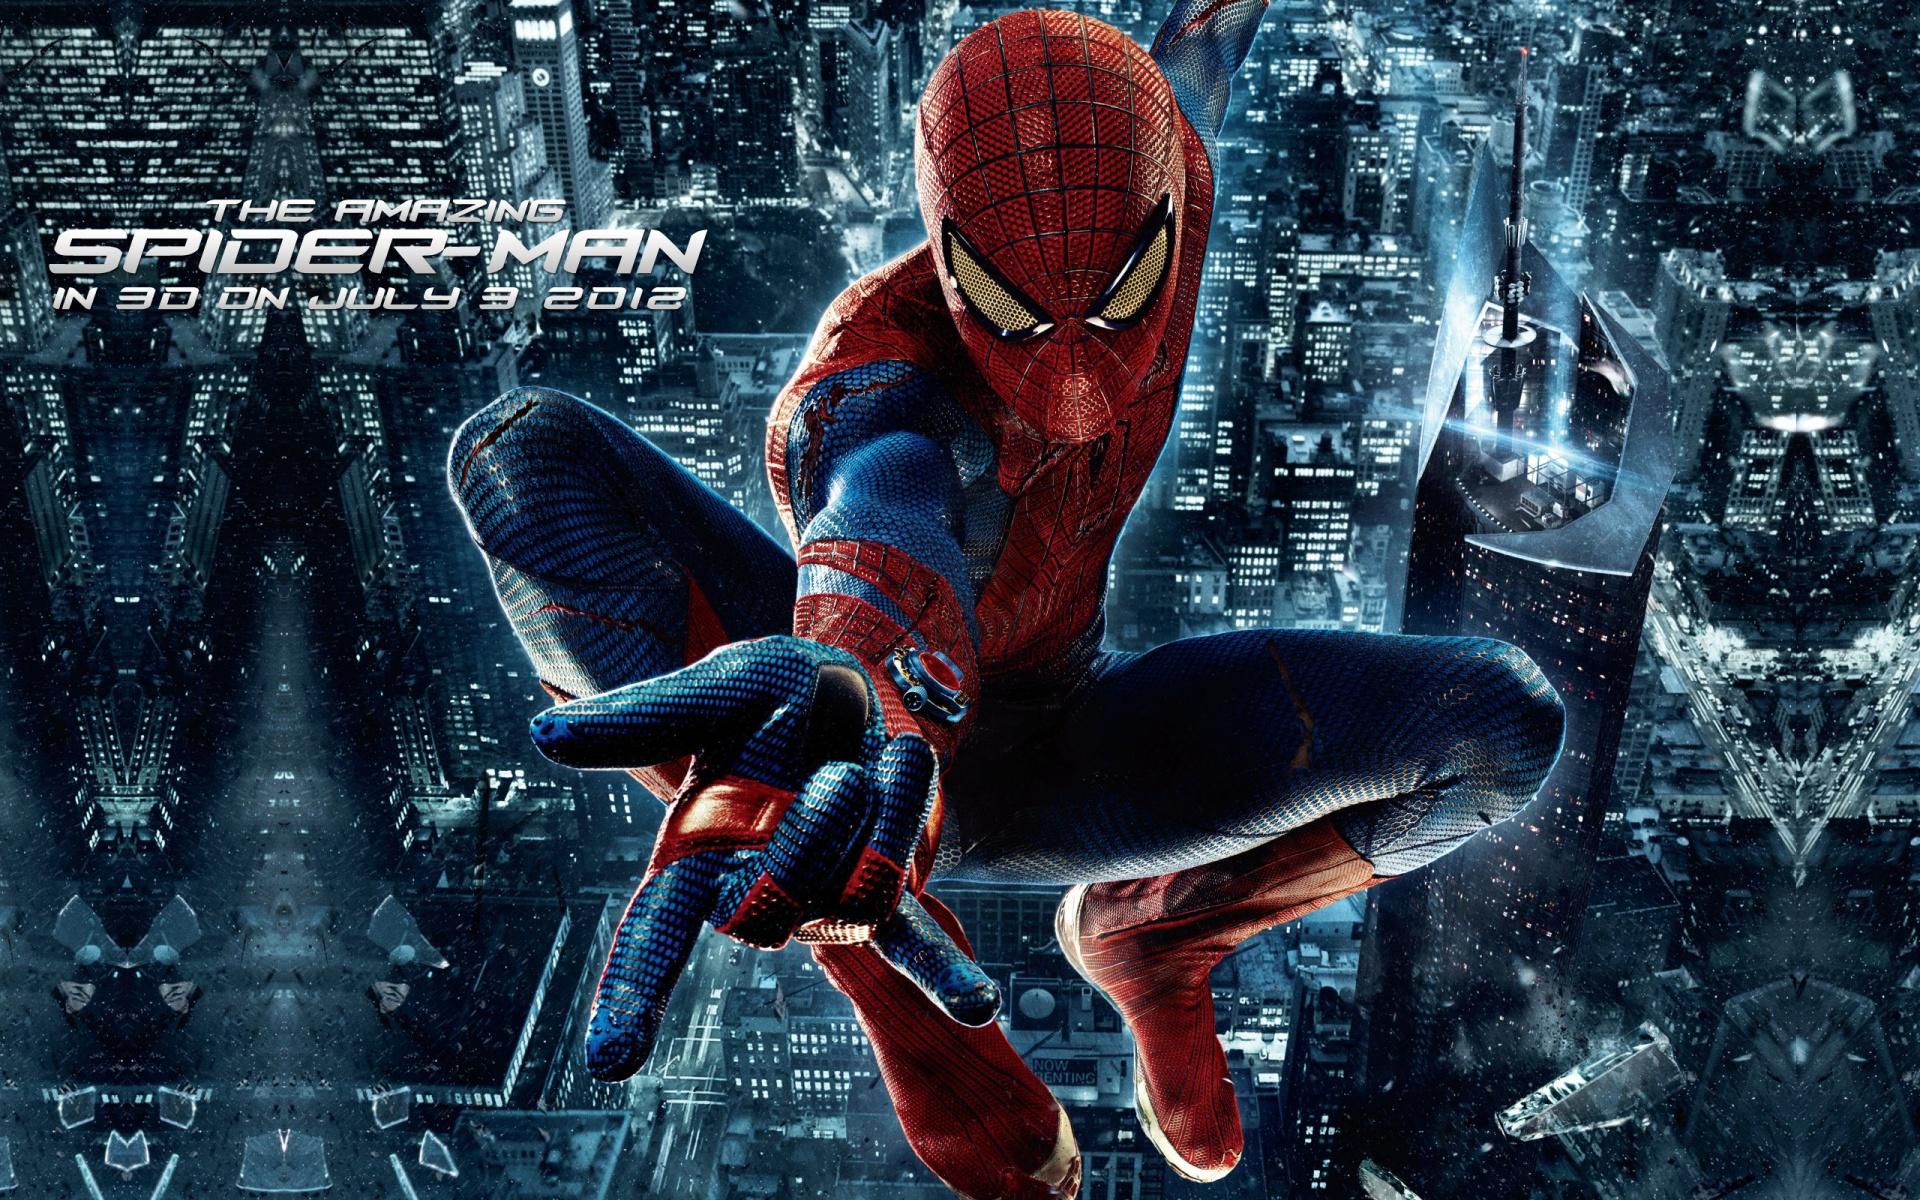 The Amazing Spider-Man Computer Wallpapers, Desktop Backgrounds